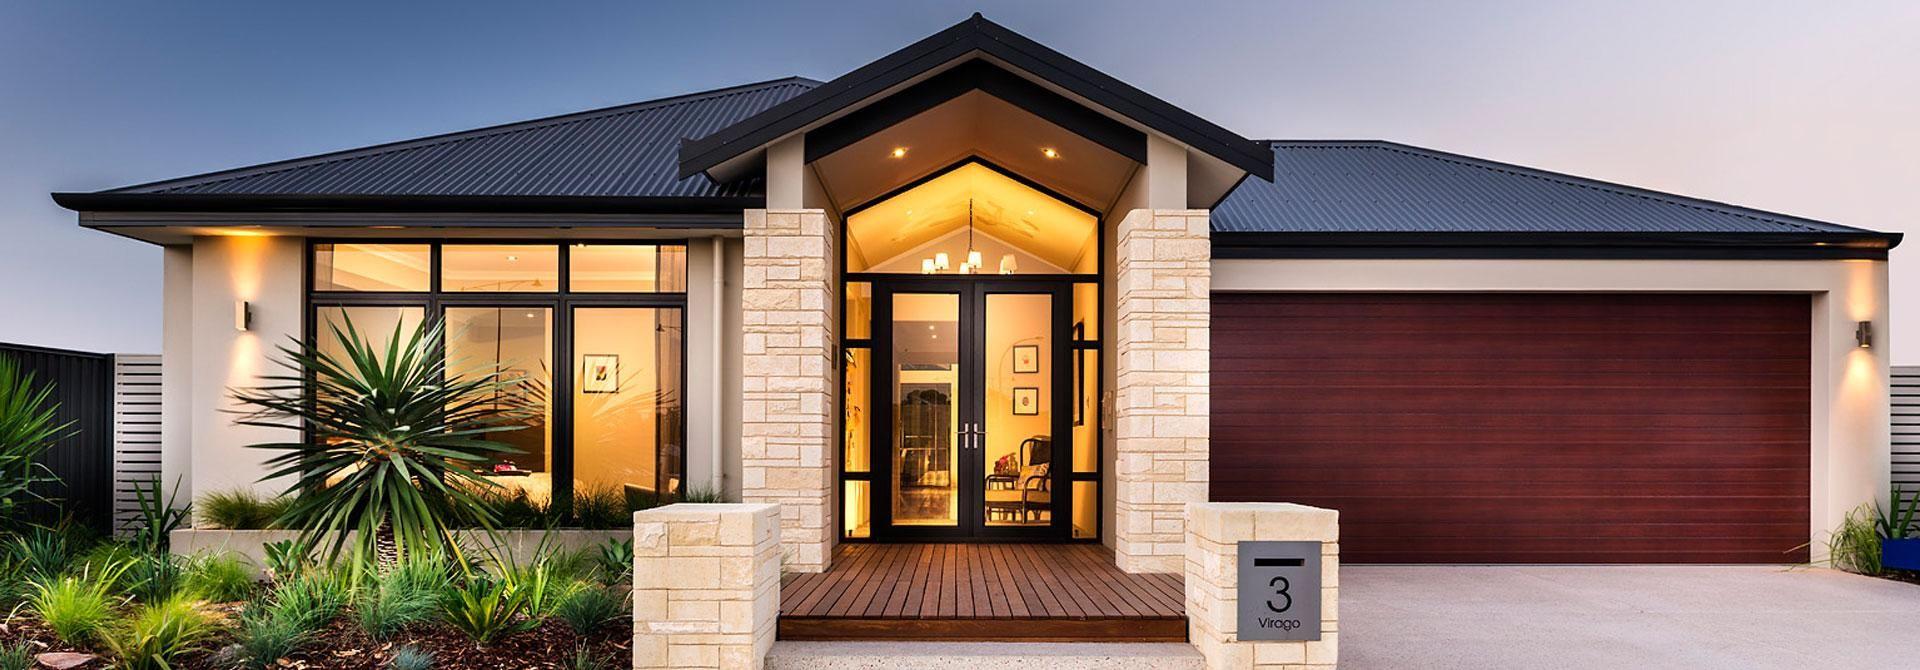 100 Buy Ex Display Home Furniture Perth Sarah Homes Home Builders Perth New Home Designs